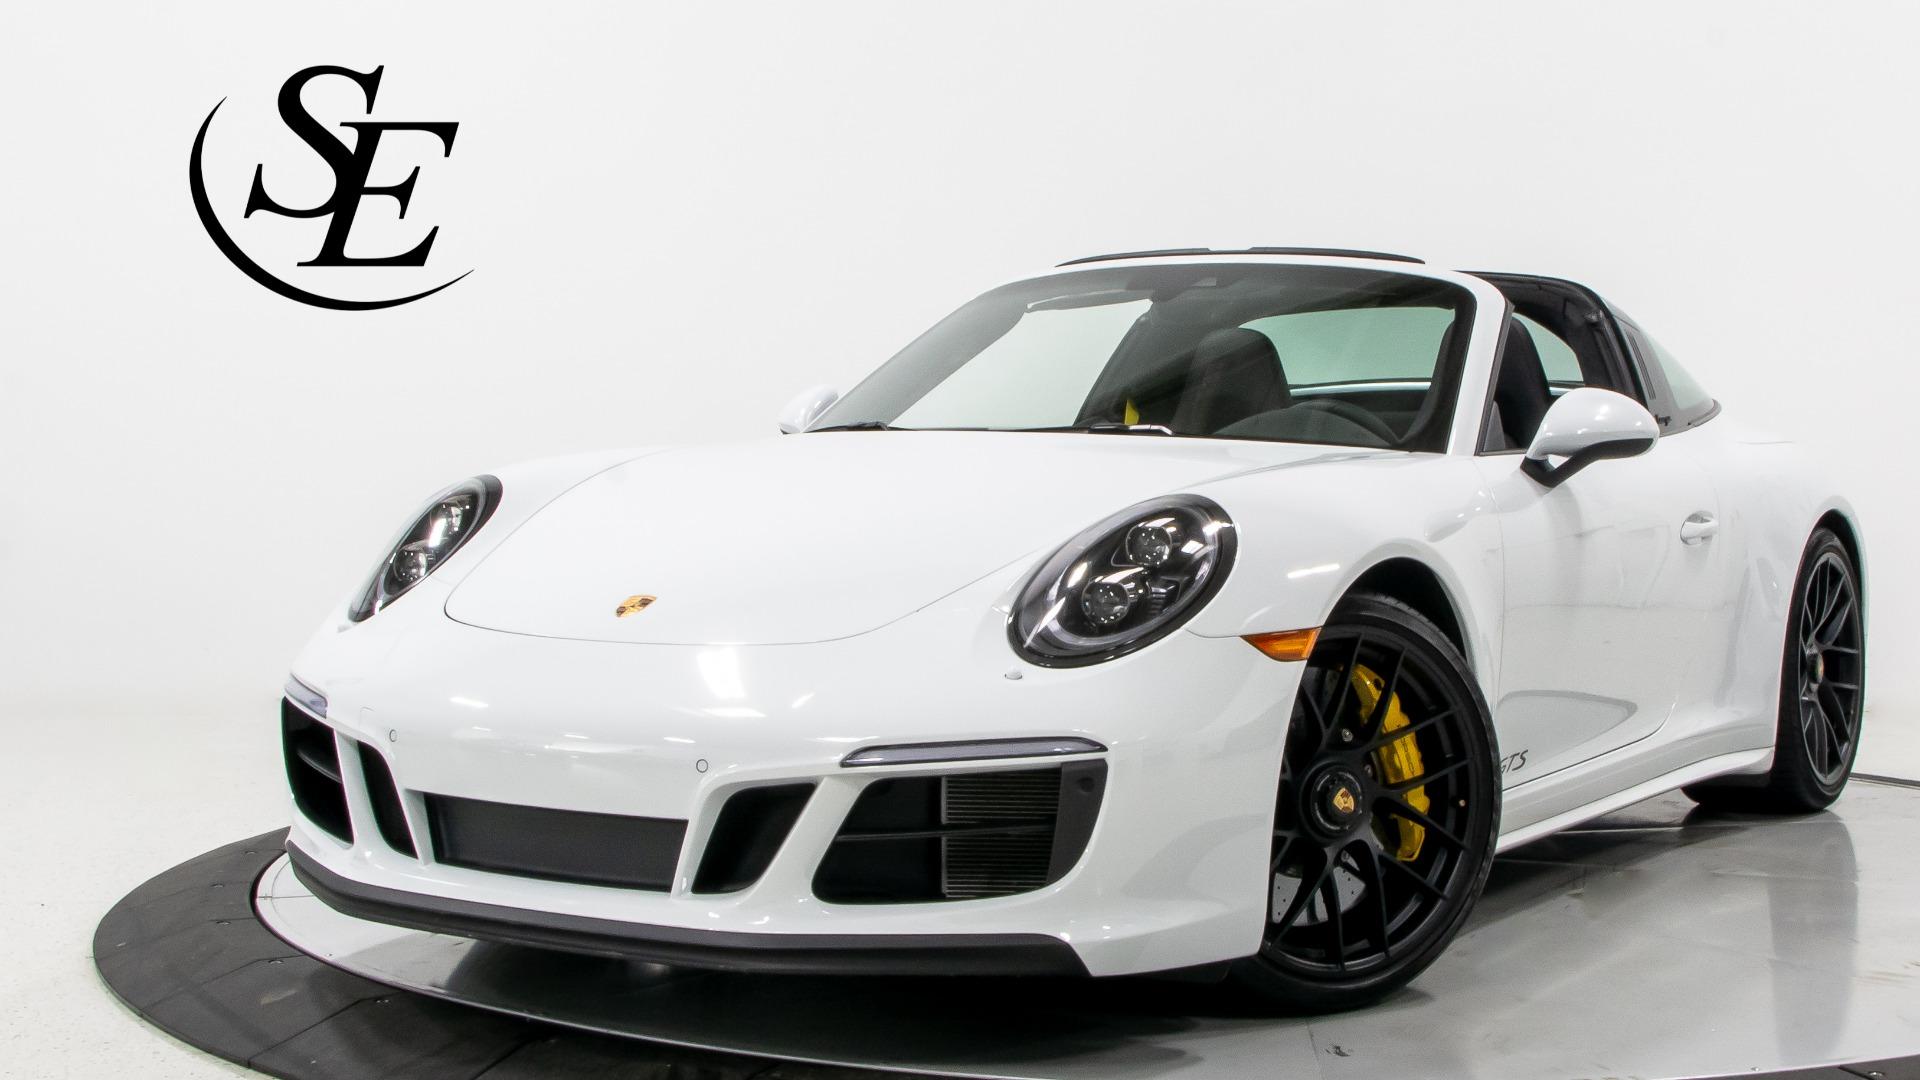 2018 Porsche 911 Targa 4 Gts 180280 Msrp Stock 22720